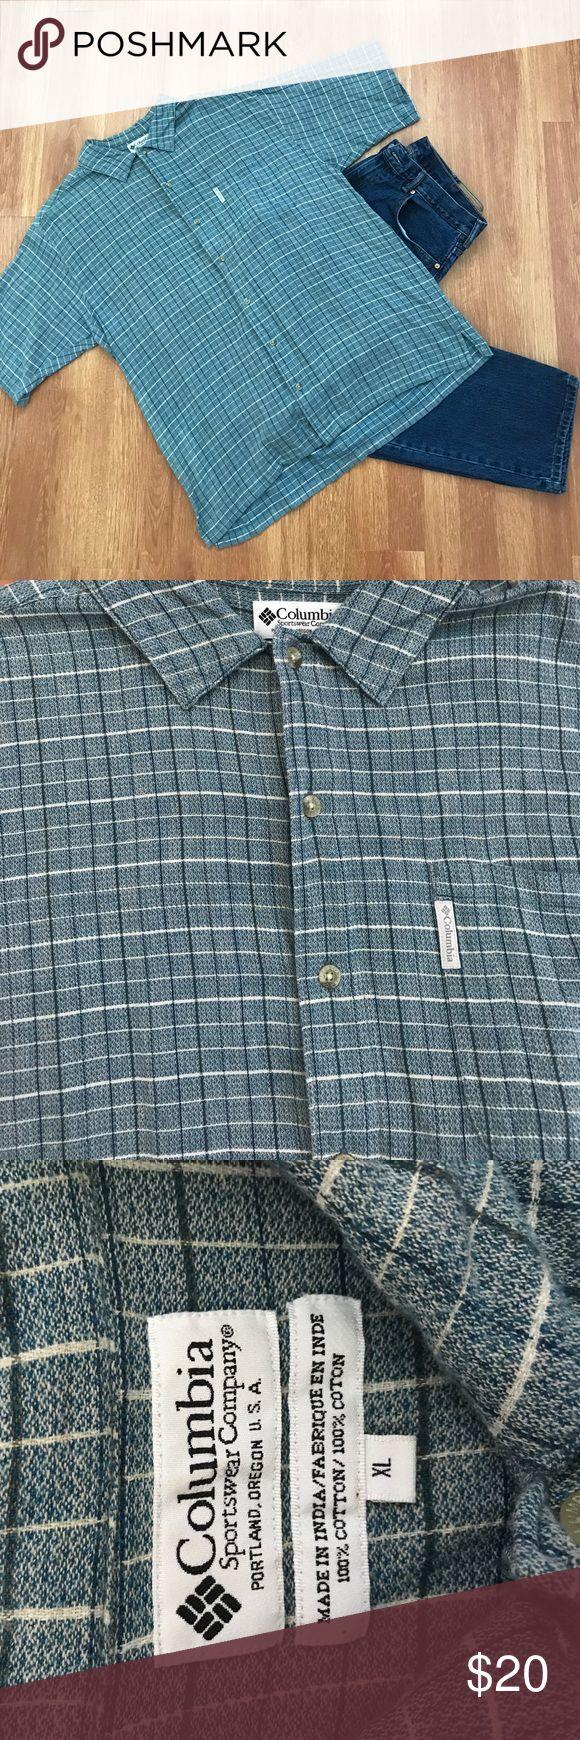 Columbia Mens Button Down Shirt Men's Columbia sportswear company button down shirt. 100% cotton. Excellent condition. Columbia Shirts Casual Button Down Shirts